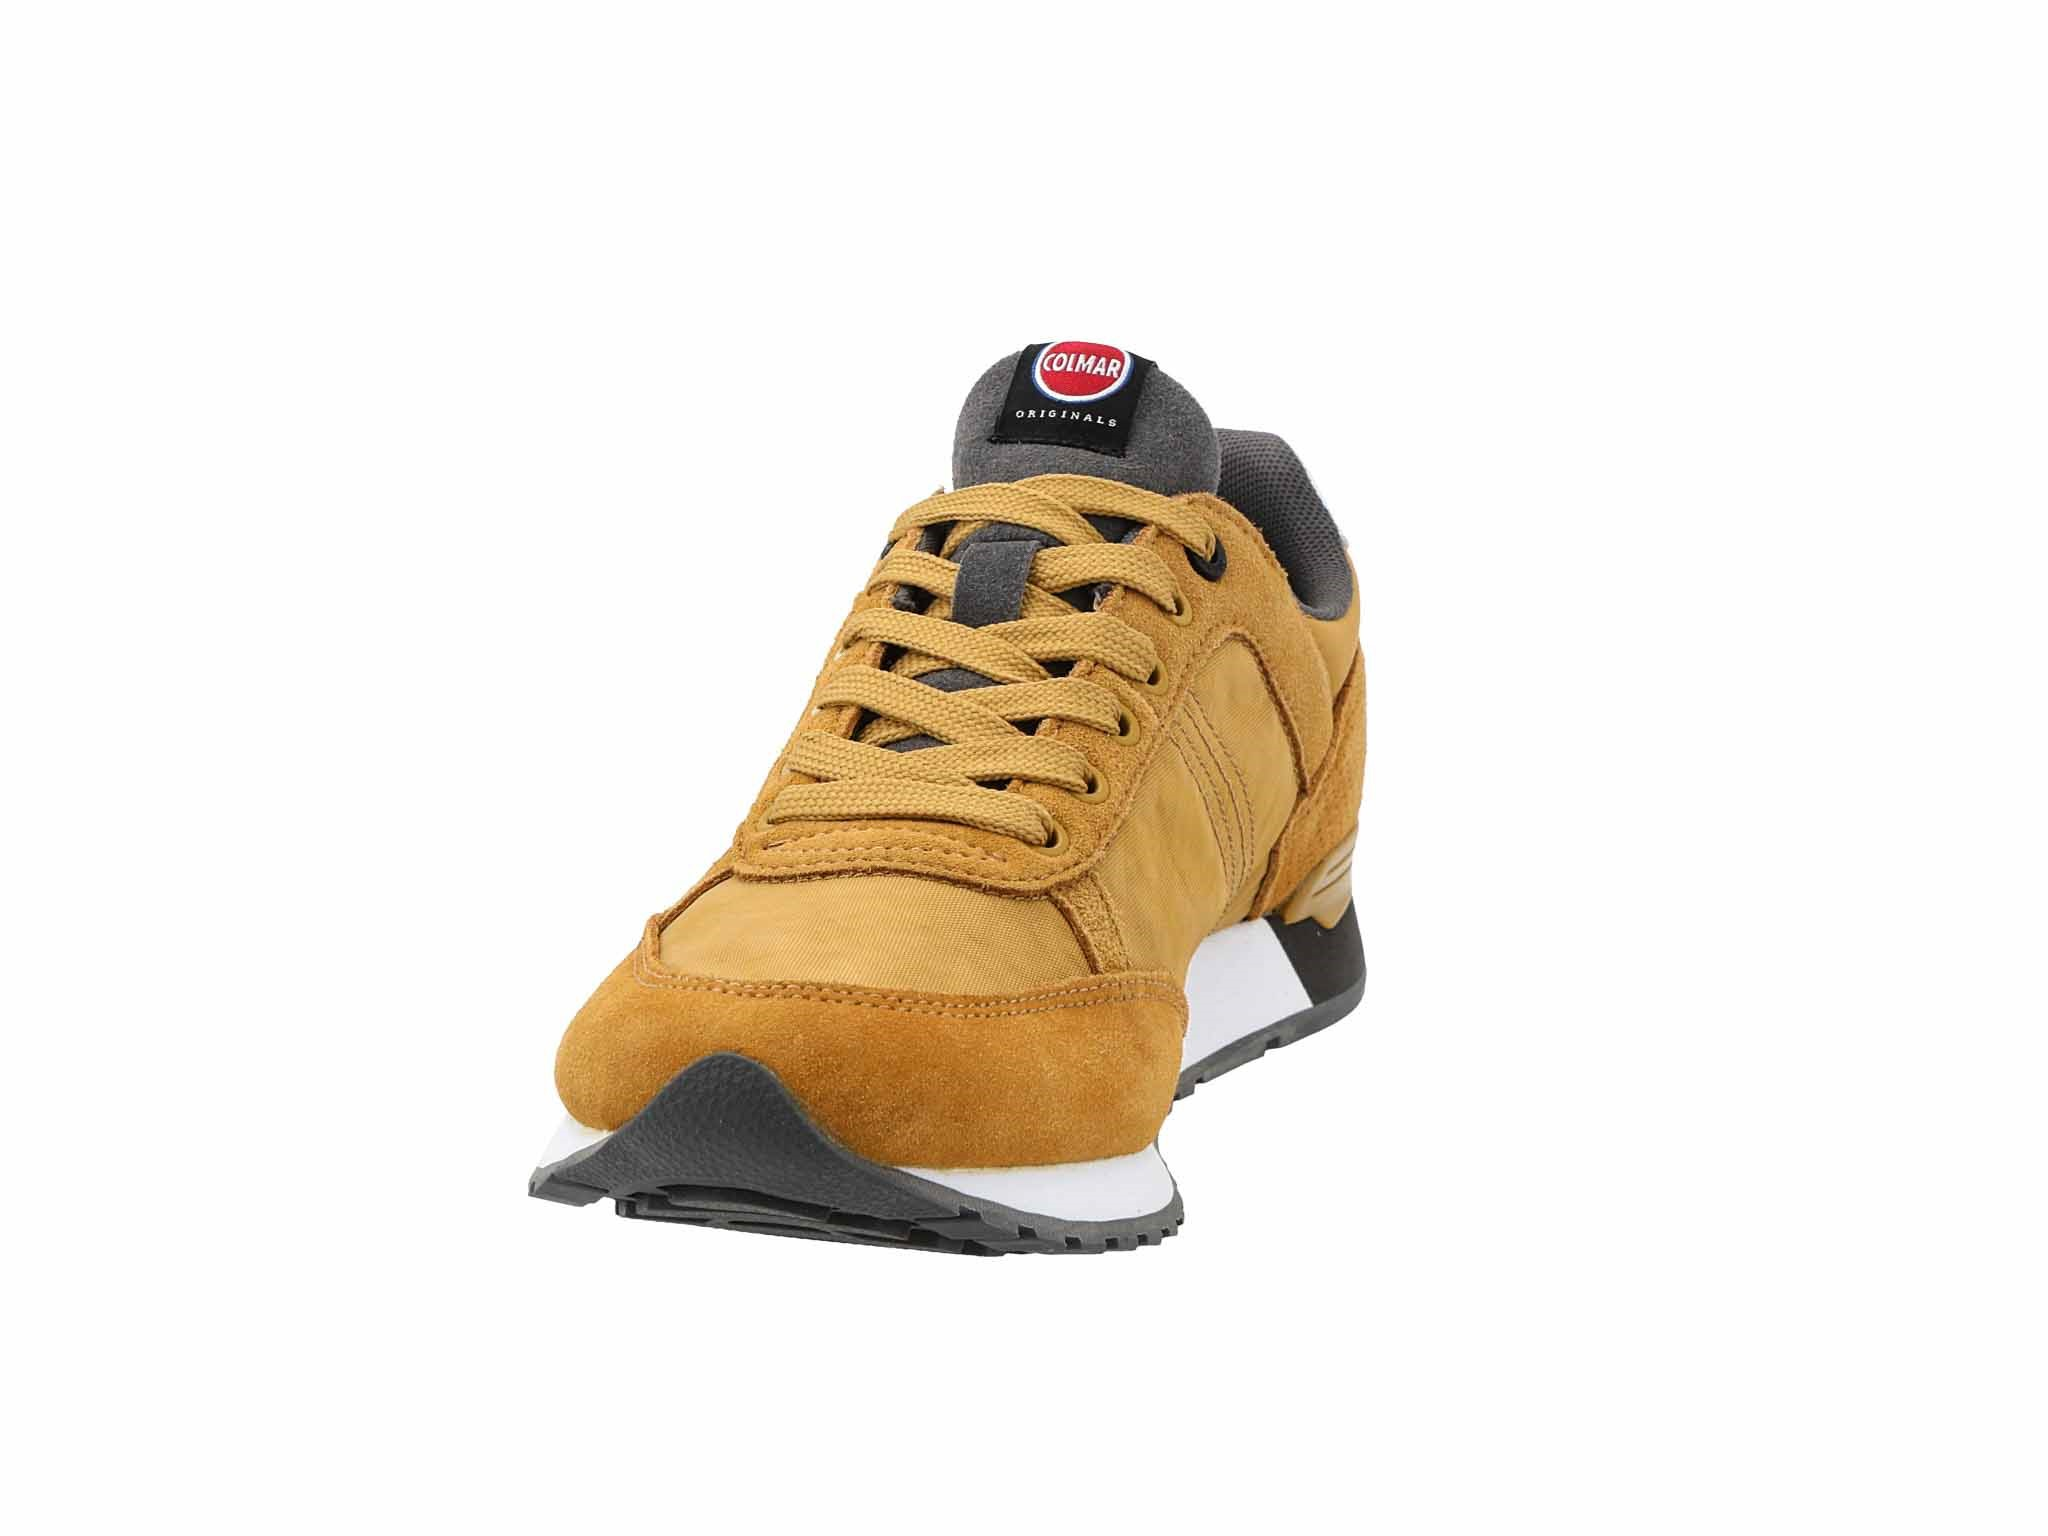 Sneakers COLMAR Travis Colors 013 OchraDk Gray